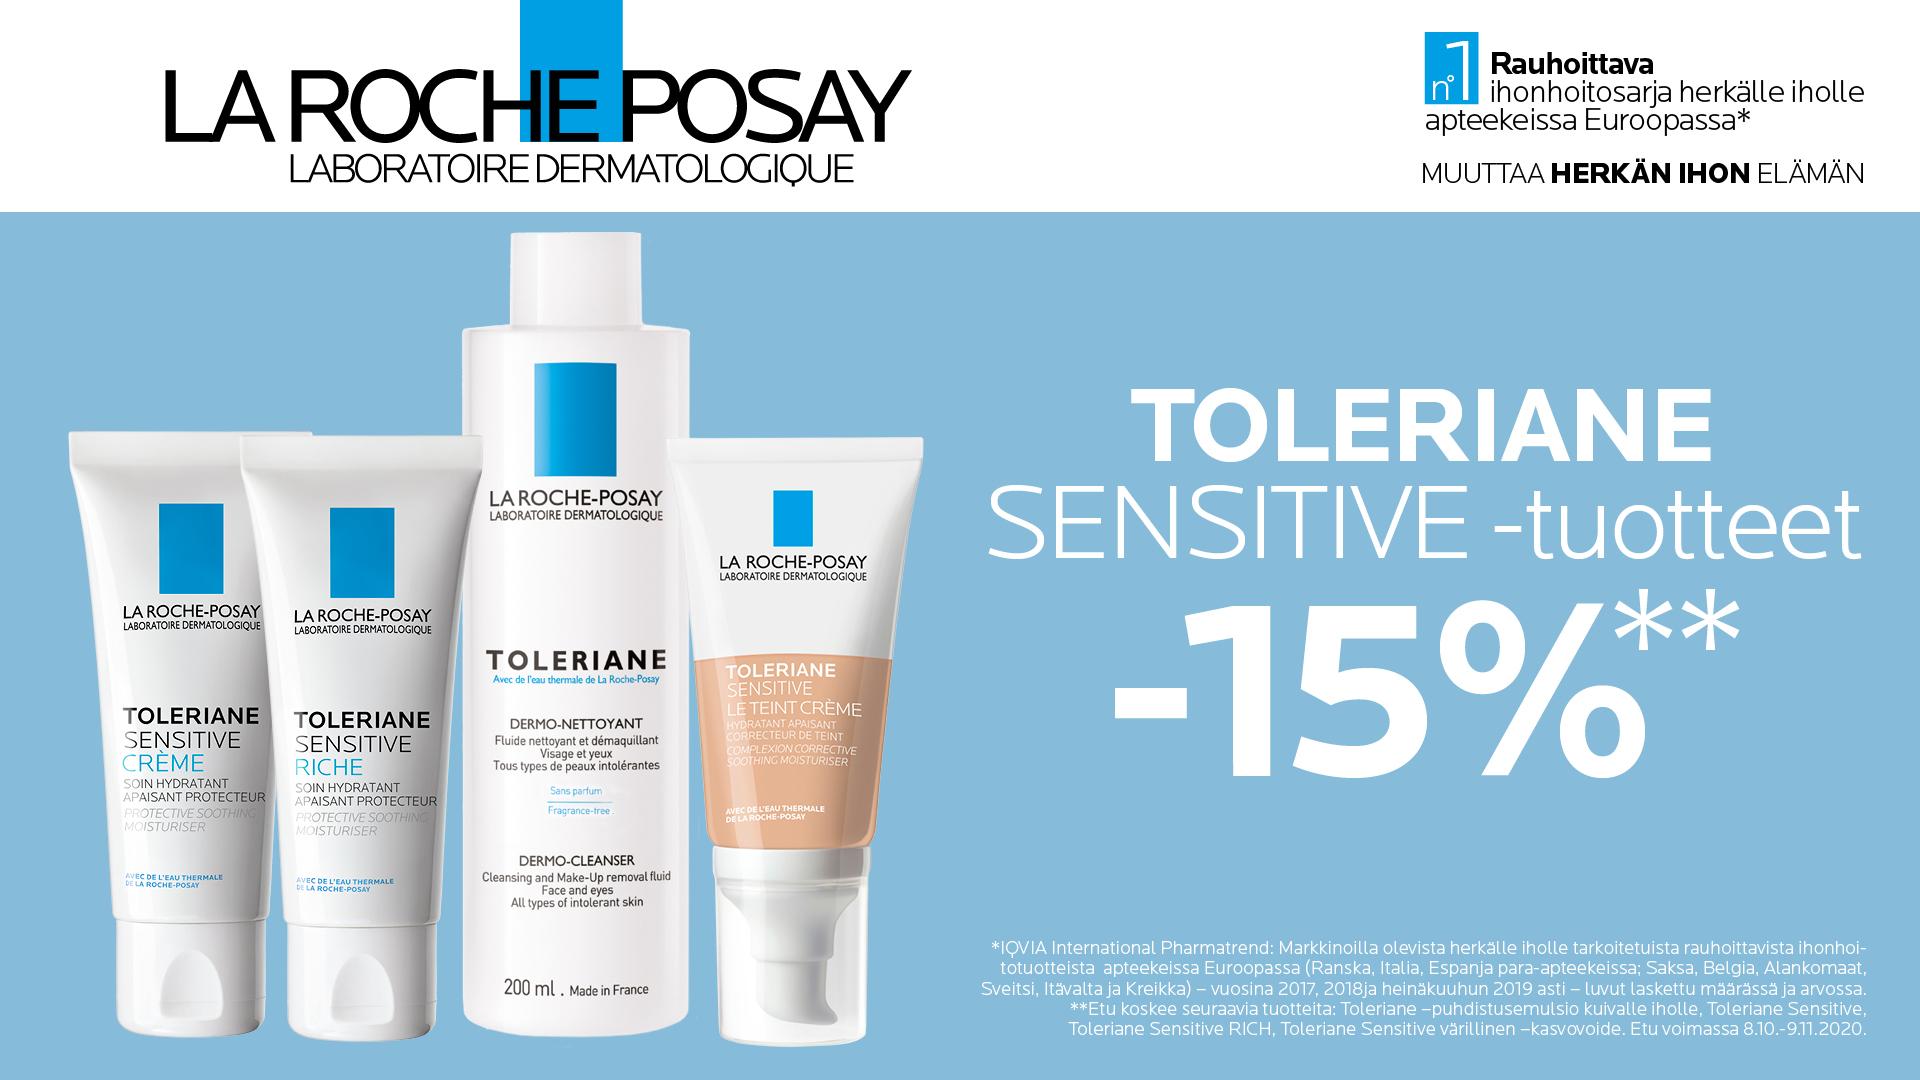 La Roche-Posay Toleriane sensitive -tuotteet -15 %